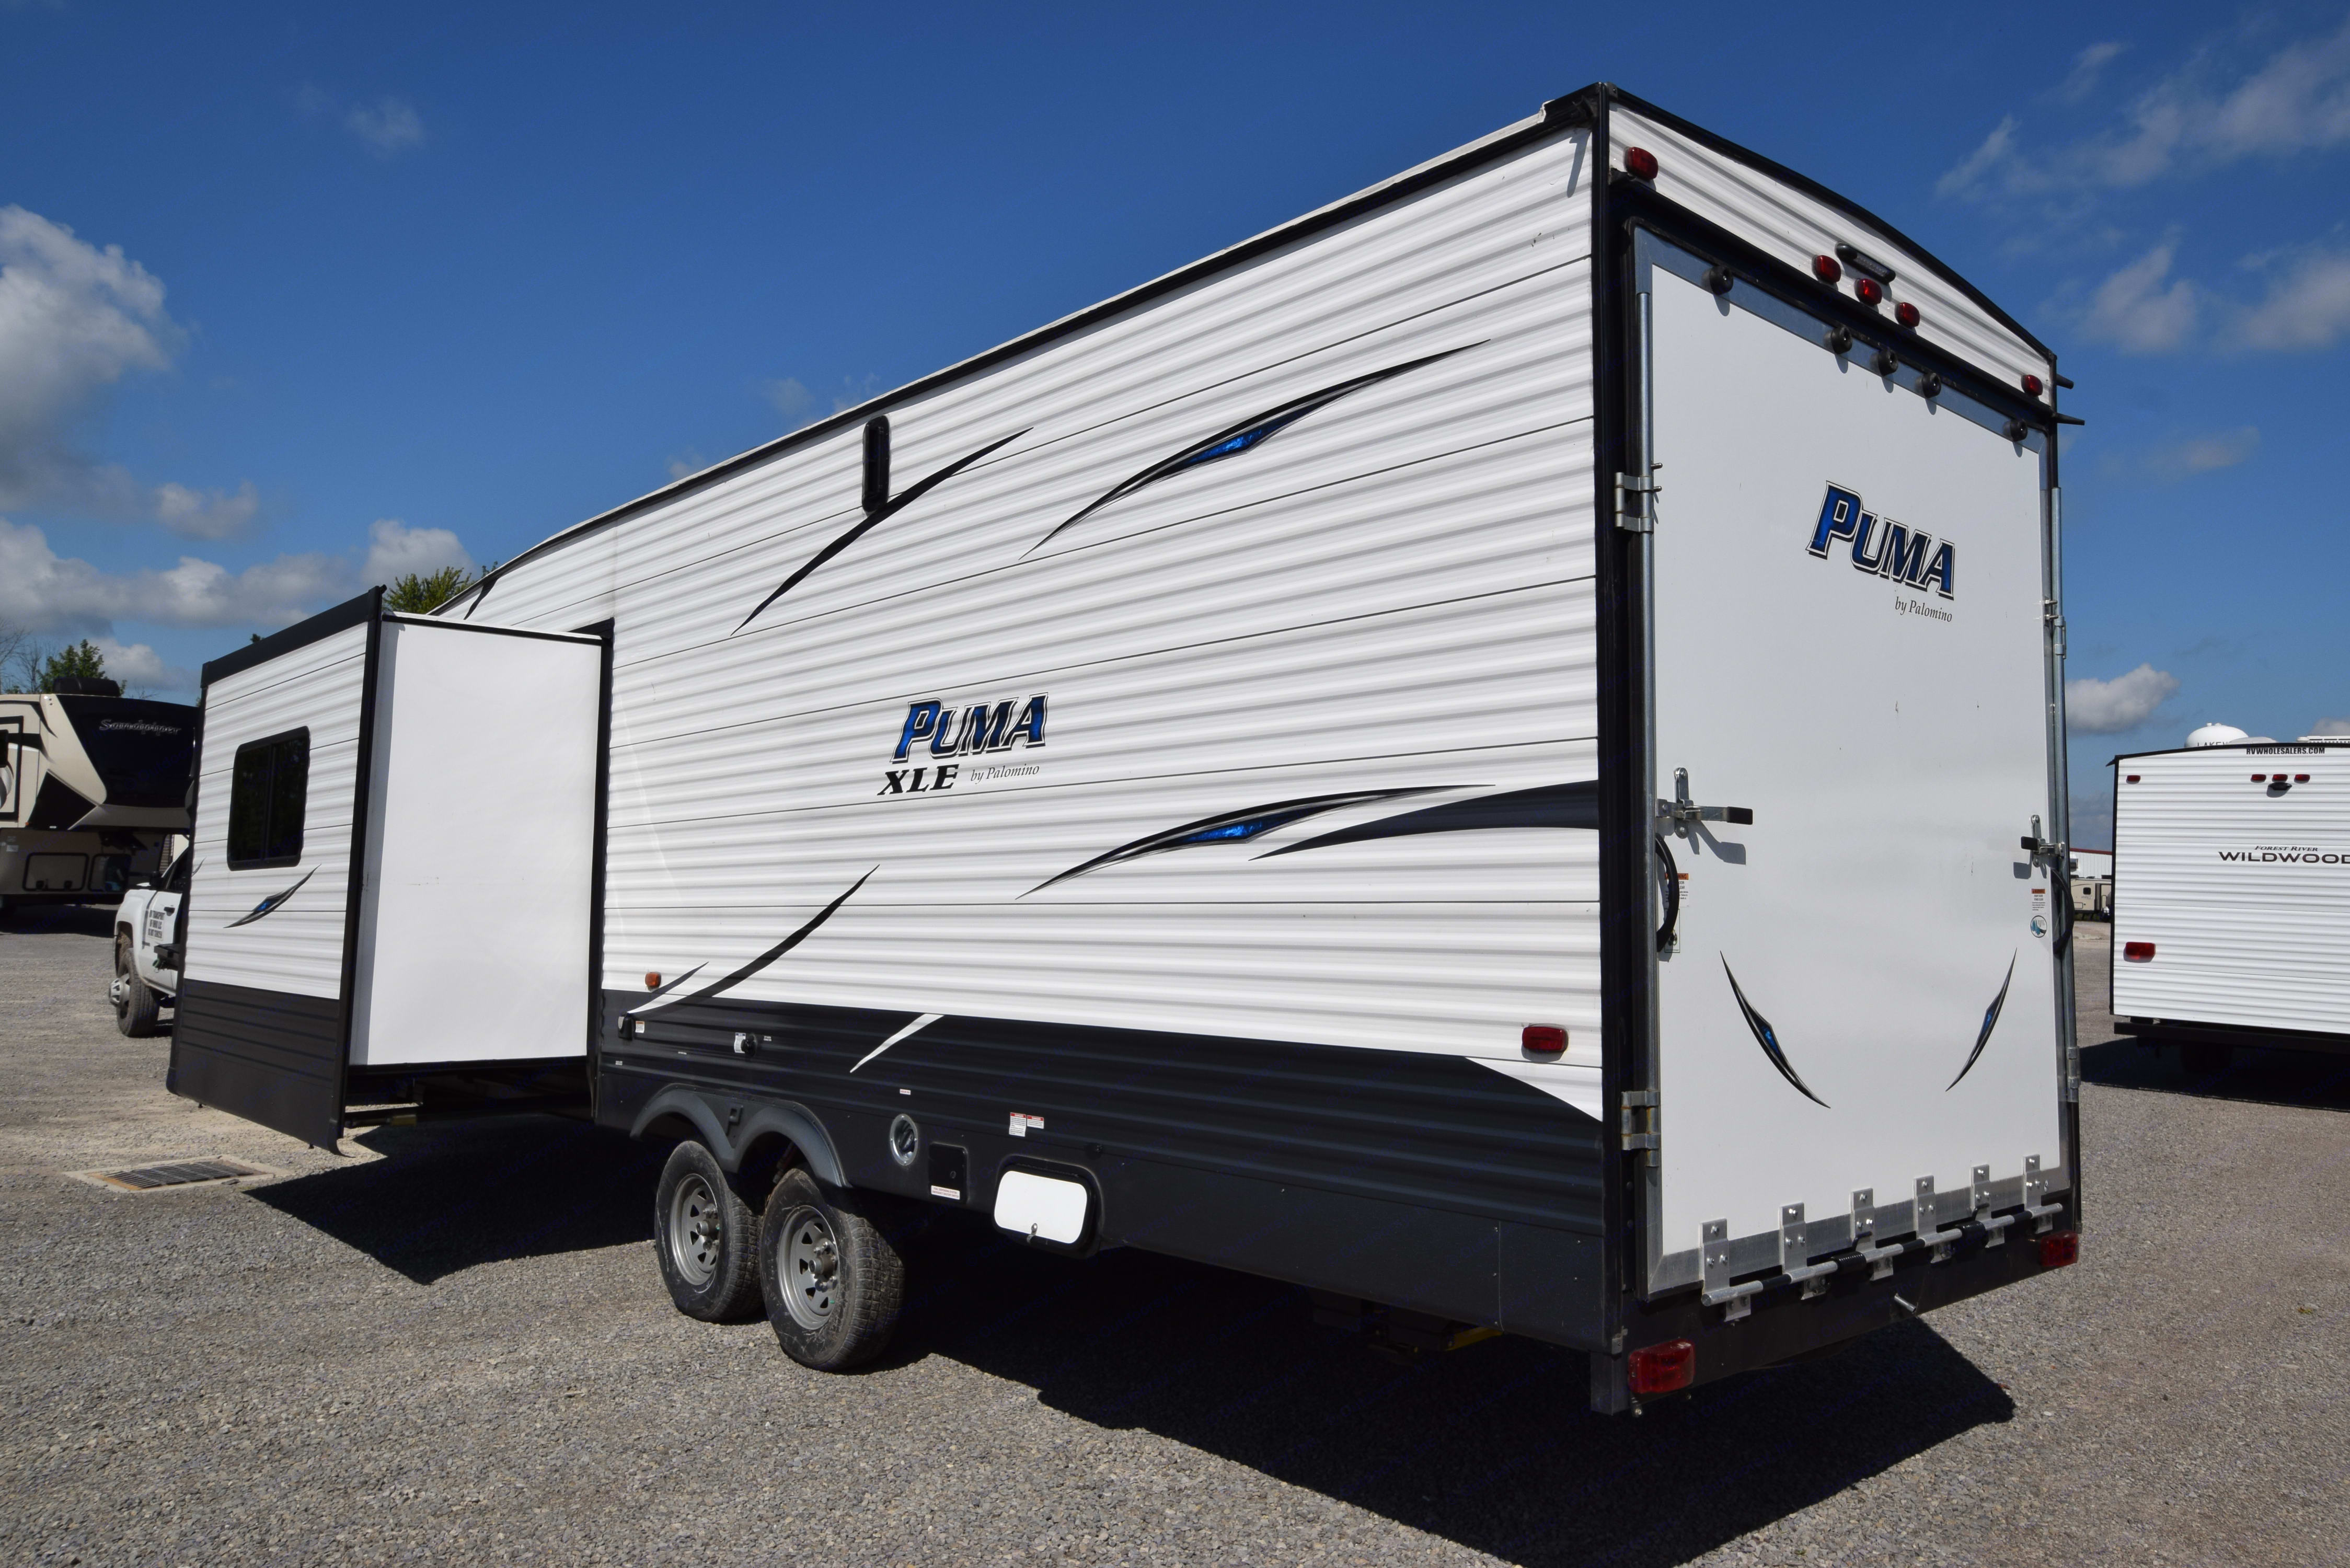 Palomino Puma XLE 2019